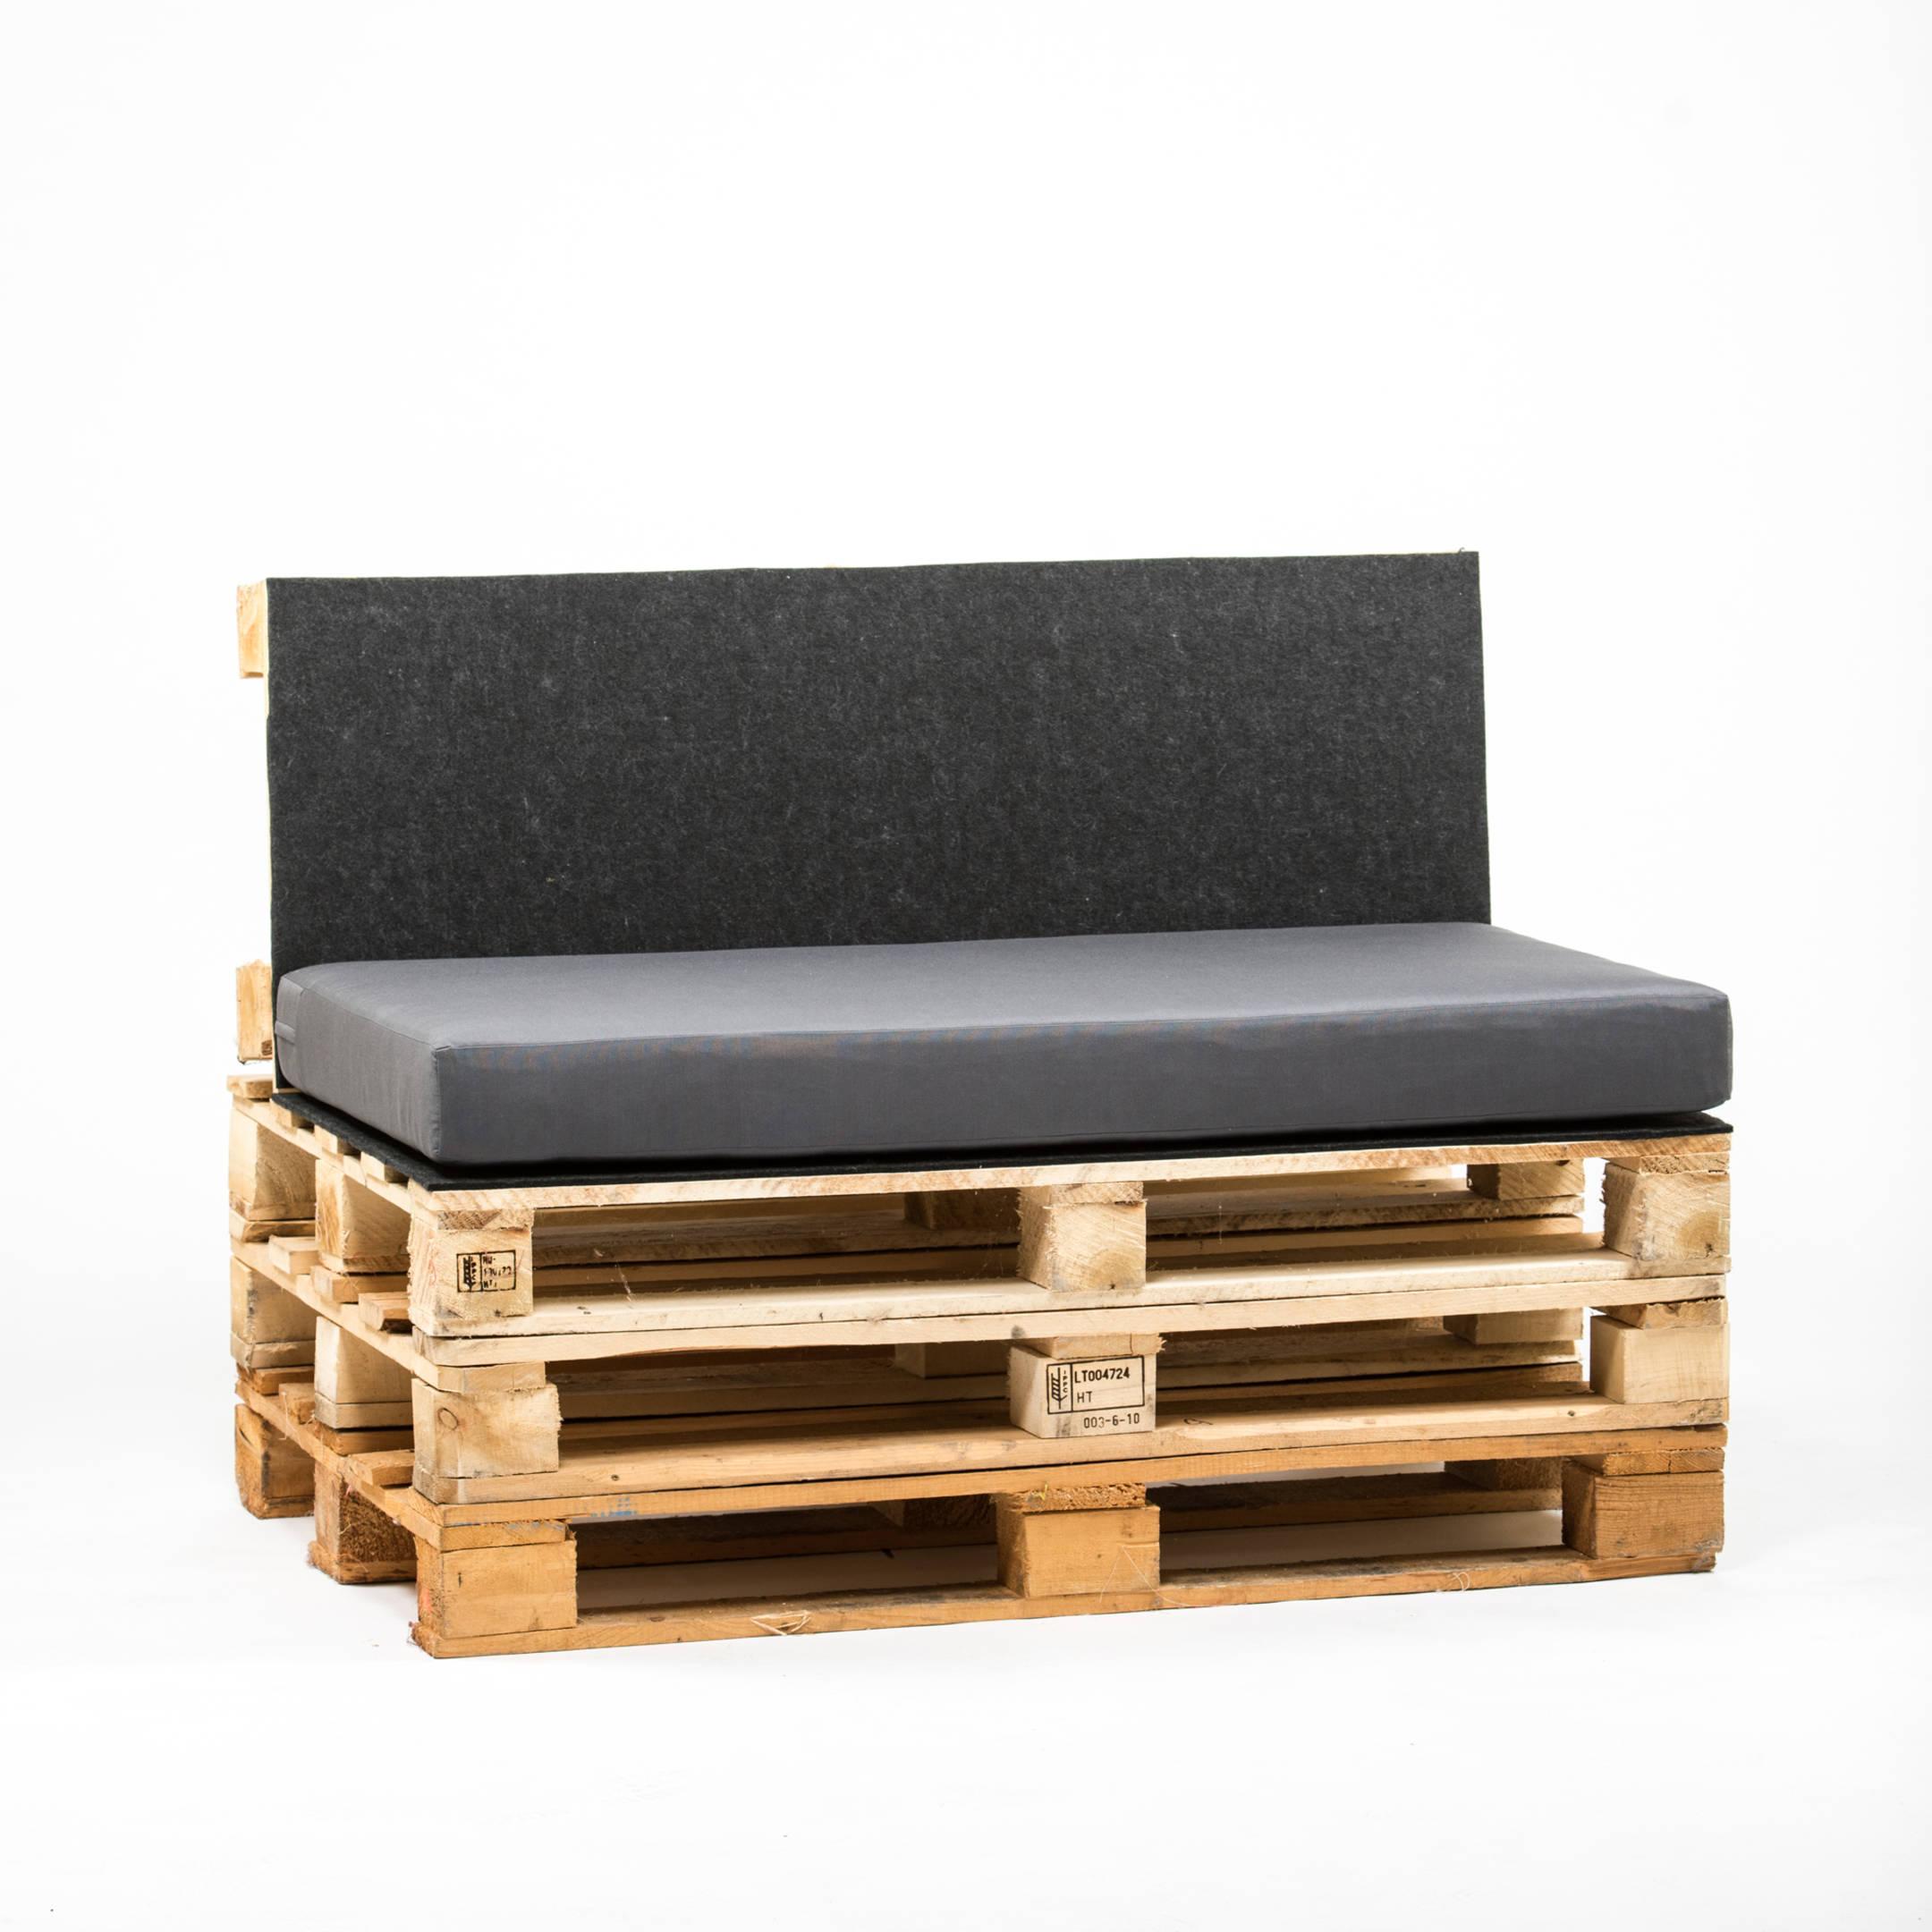 palette sitzkissen 120x60x10 cm. Black Bedroom Furniture Sets. Home Design Ideas